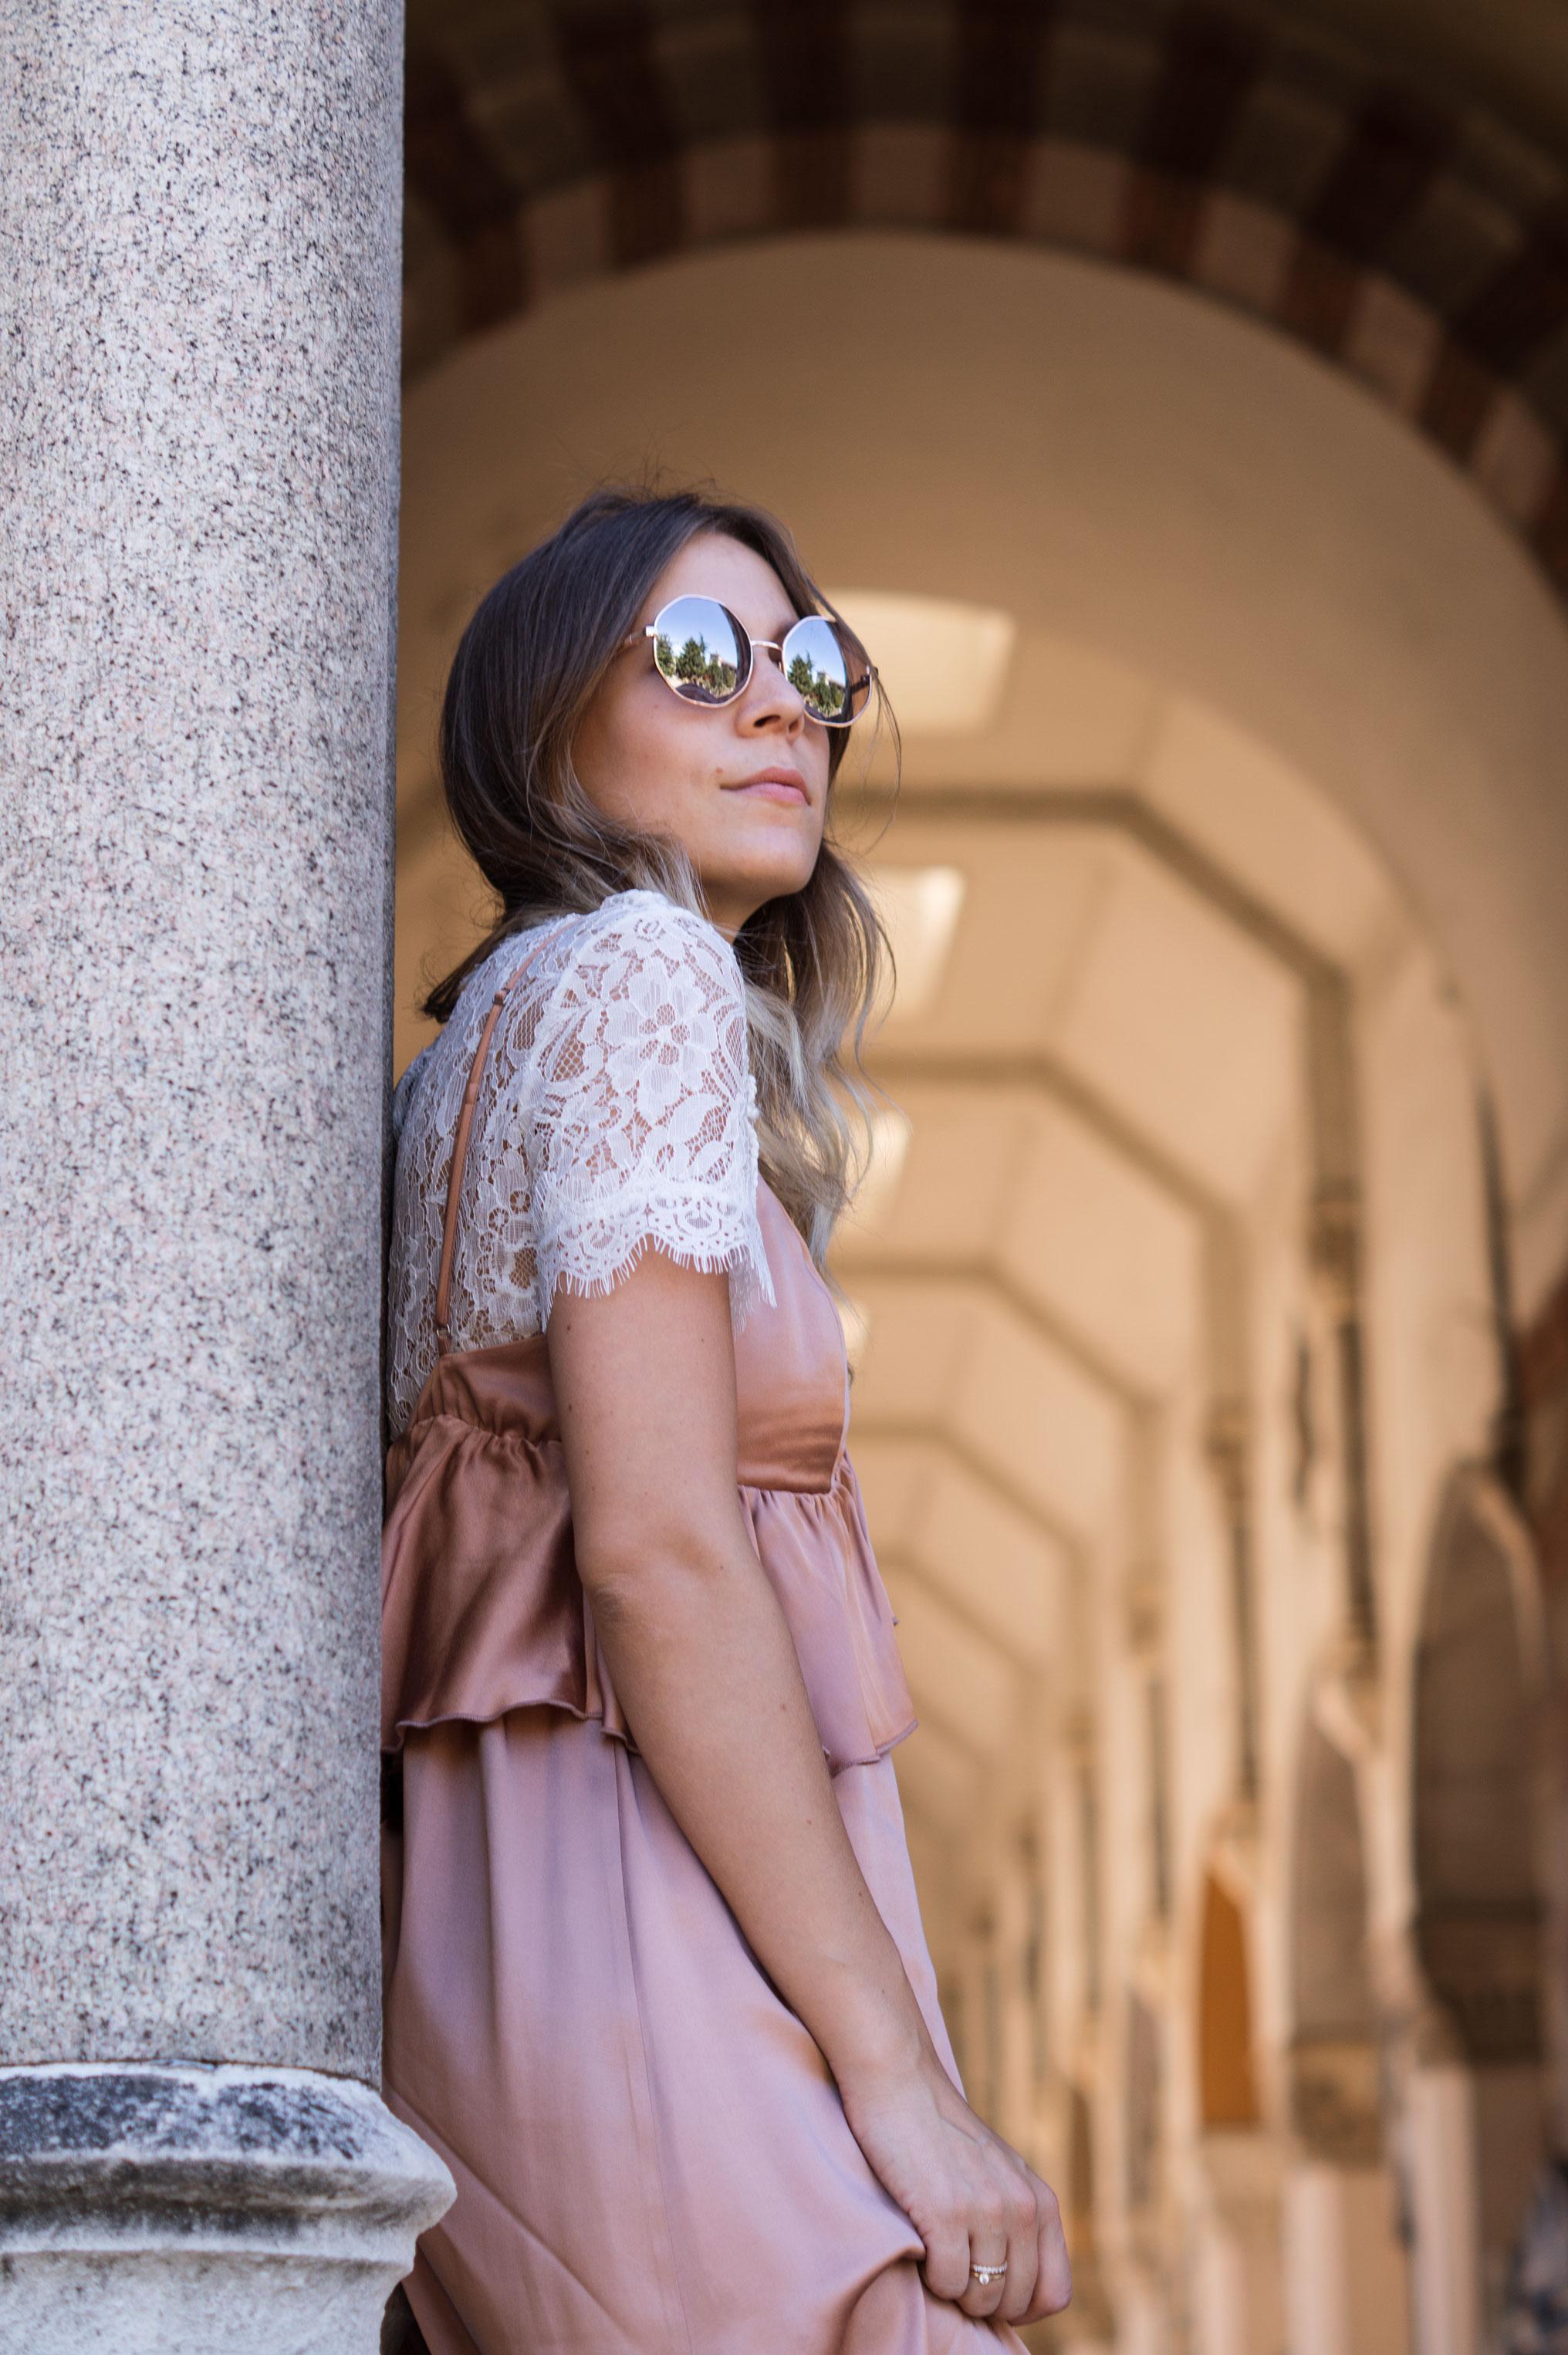 Copper Slipdress rosa Satinkleid silk dress ruffles Rüschenkleid H&M Sariety Modeblog Heidelberg Fashionblogger Milan Mailand Shooting-7